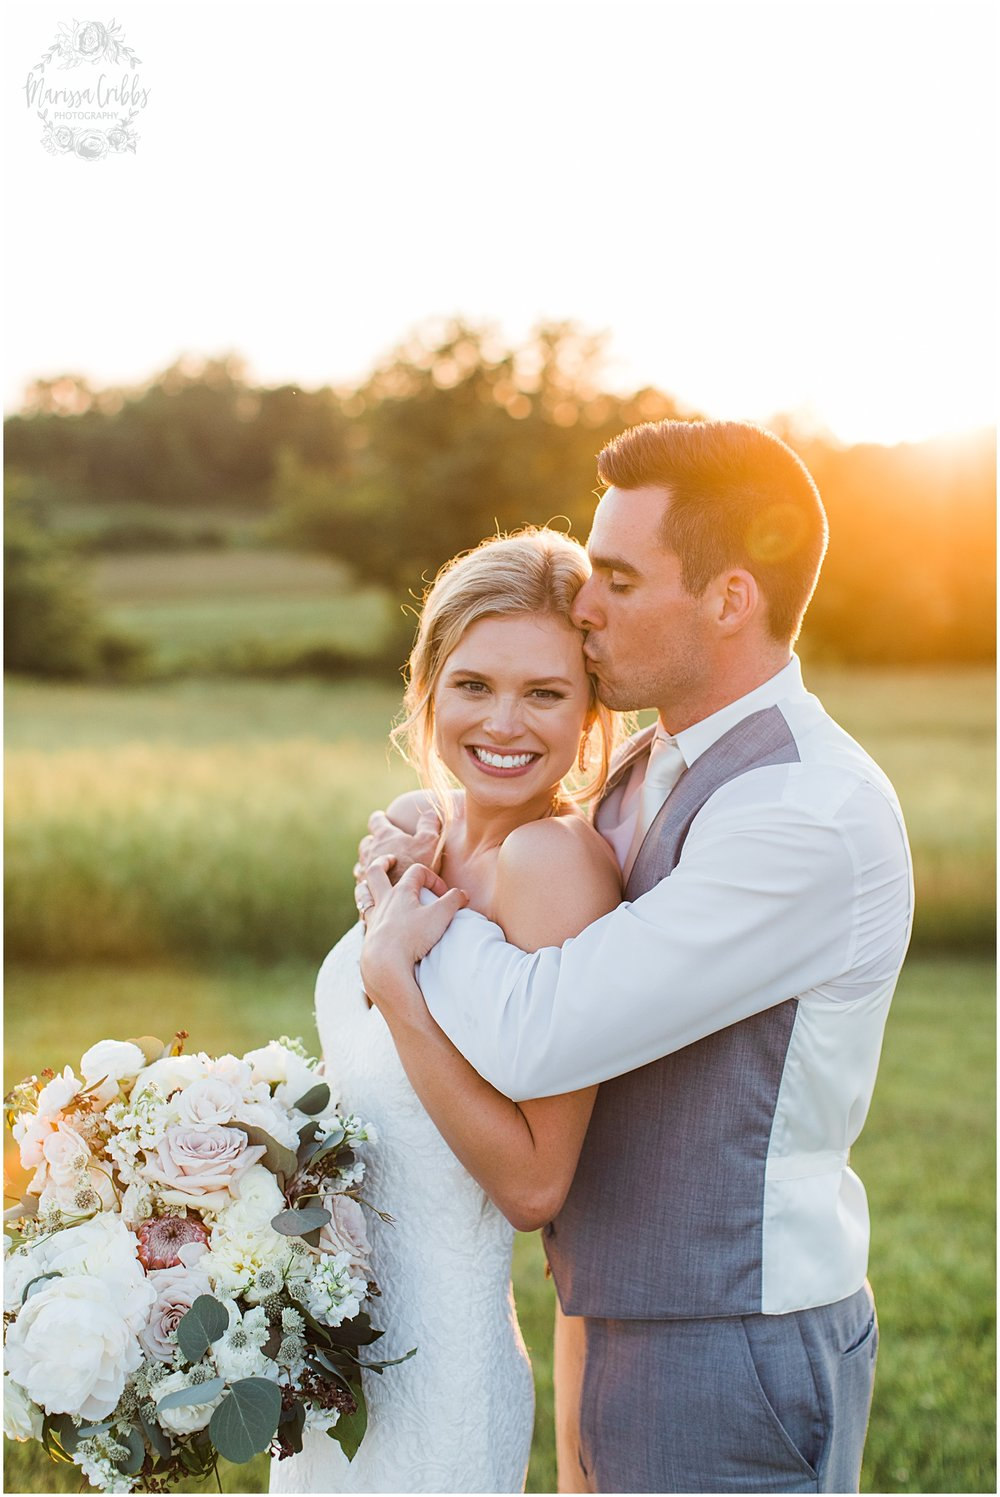 RHODES WEDDING | WESTON RED BARN FARM | MARISSA CRIBBS PHOTOGRAPHY_5320.jpg